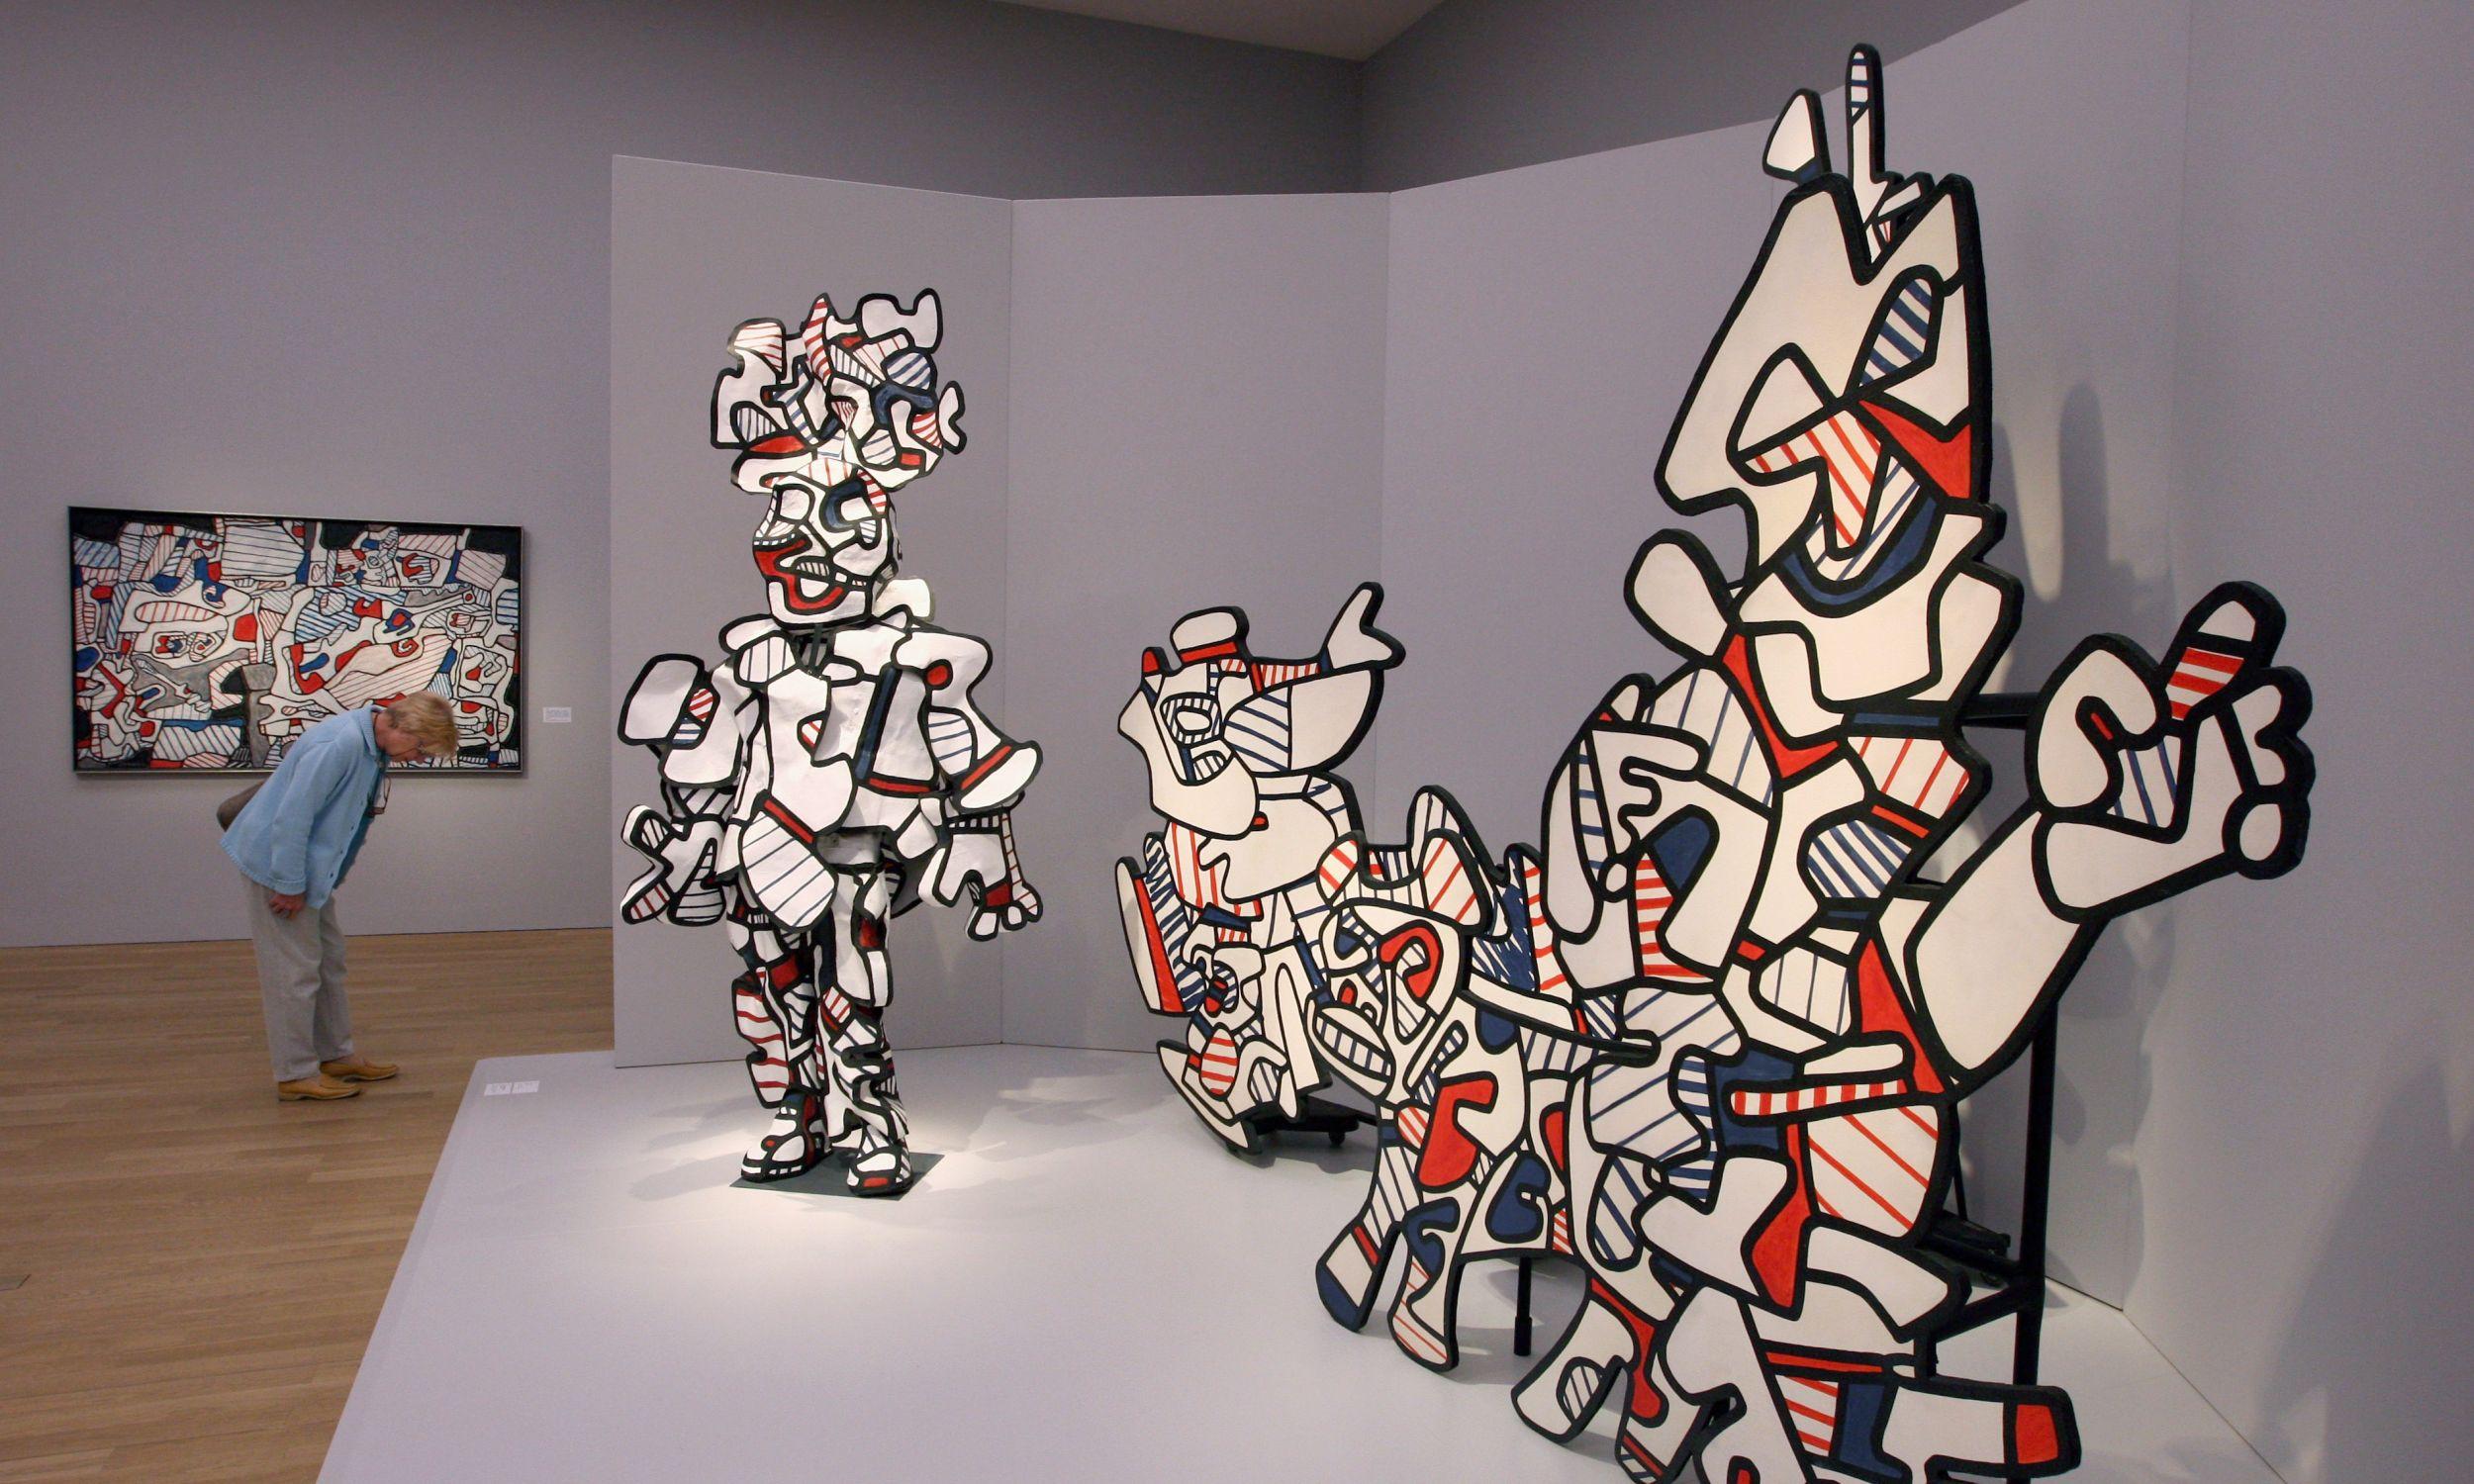 Wystawa prac Jeana Dubuffet w Monachium, 2009 rok. Fot. Miguel Villagran/Getty Images